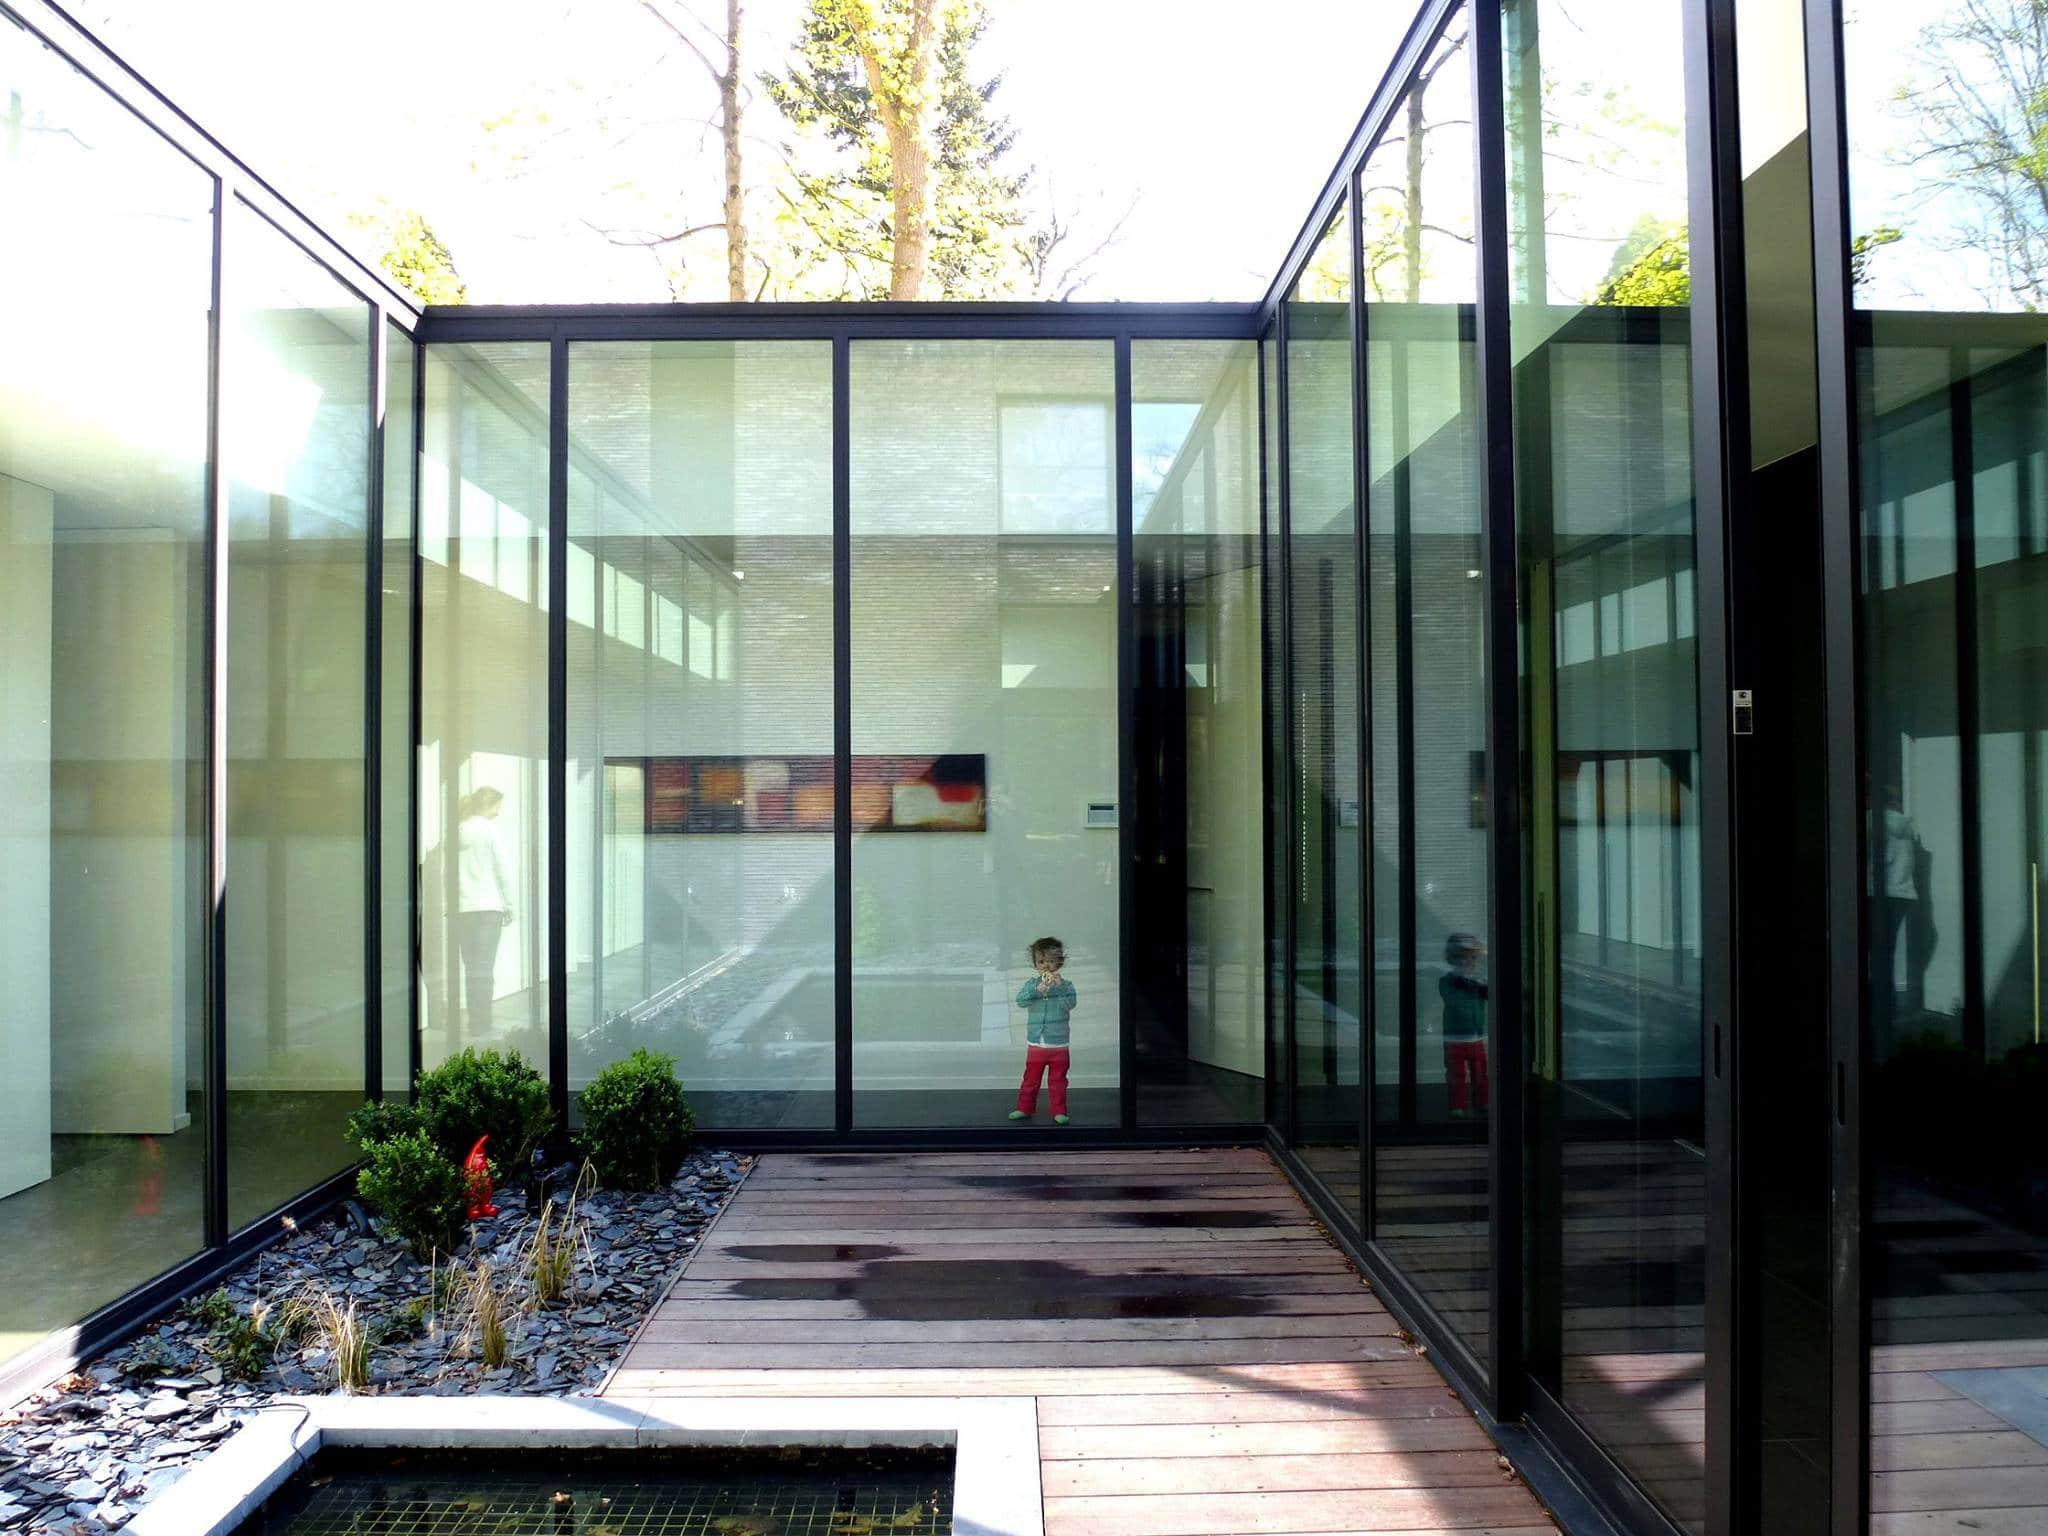 10255834 625077224236822 8374225212029997009 o | Baeyens & Beck architecten Gent | architect nieuwbouw renovatie interieur | high end | architectenbureau